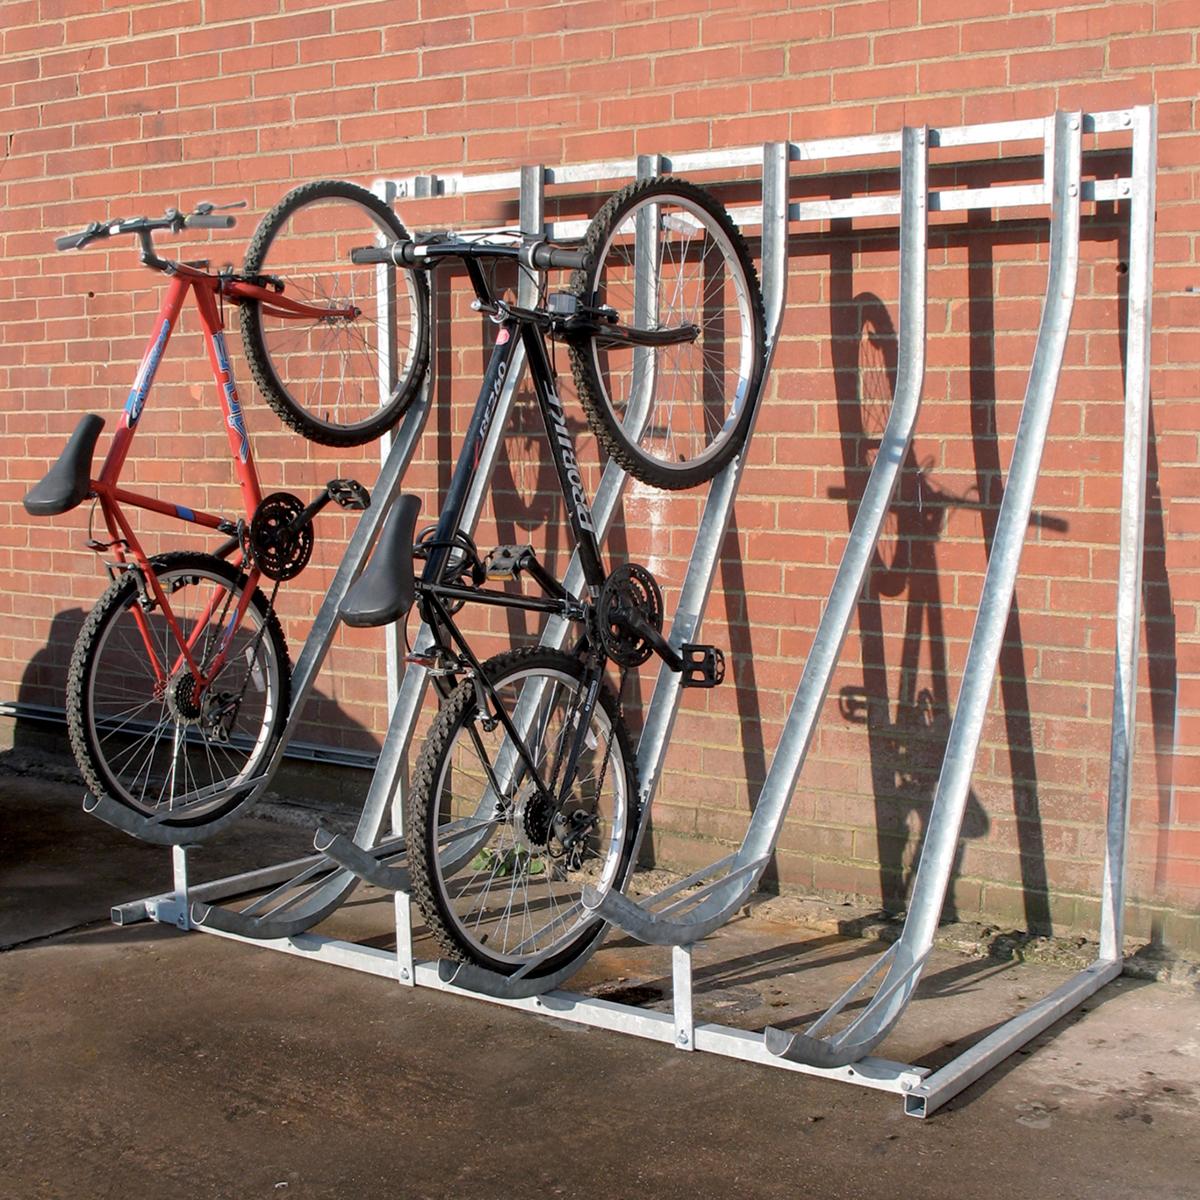 Neath Cycle Rack